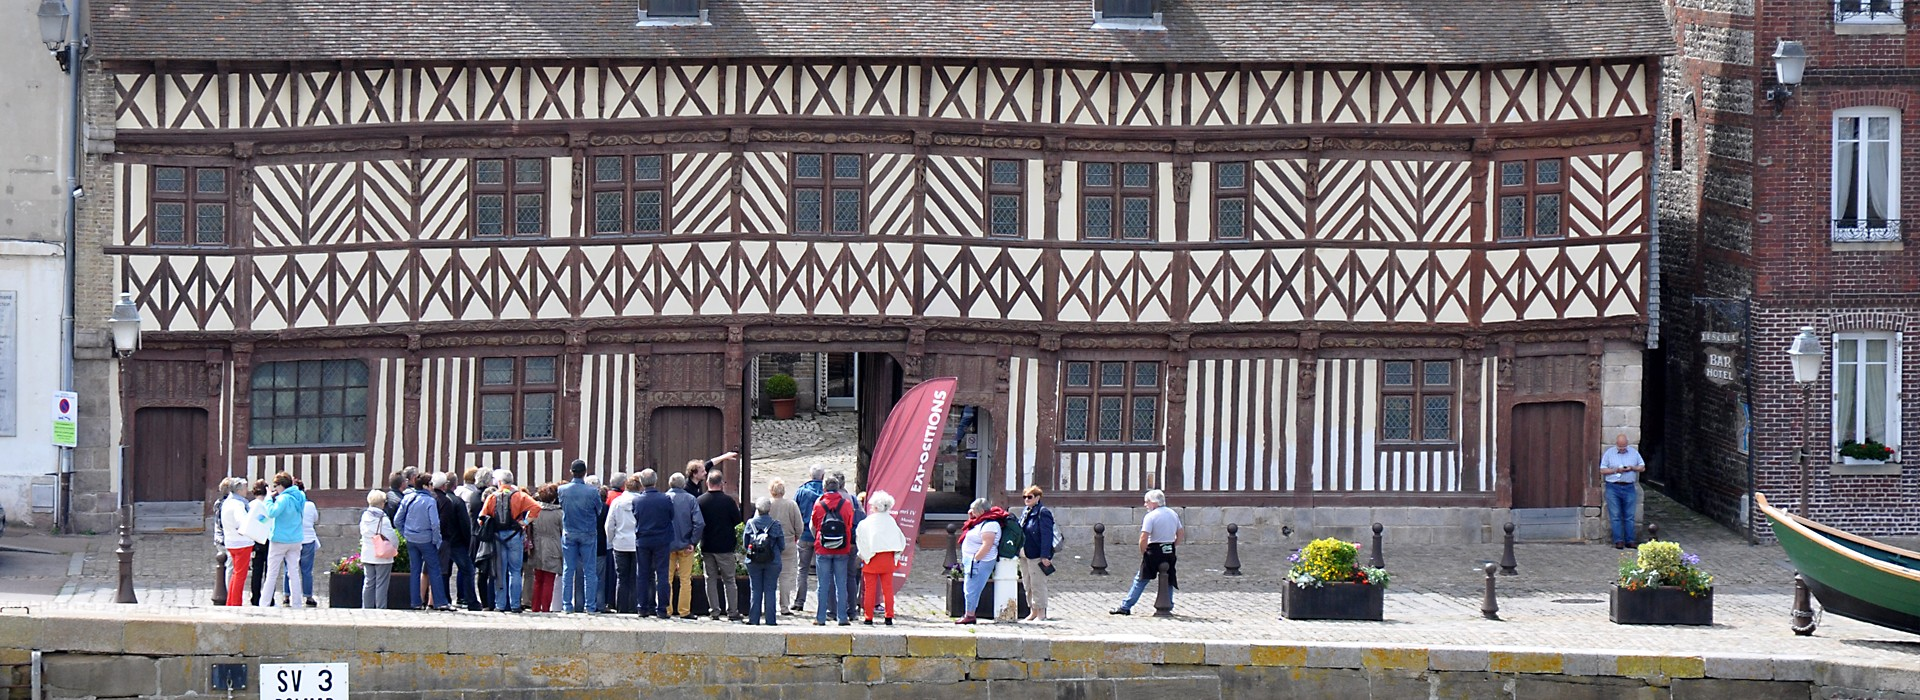 Maison Henri IV